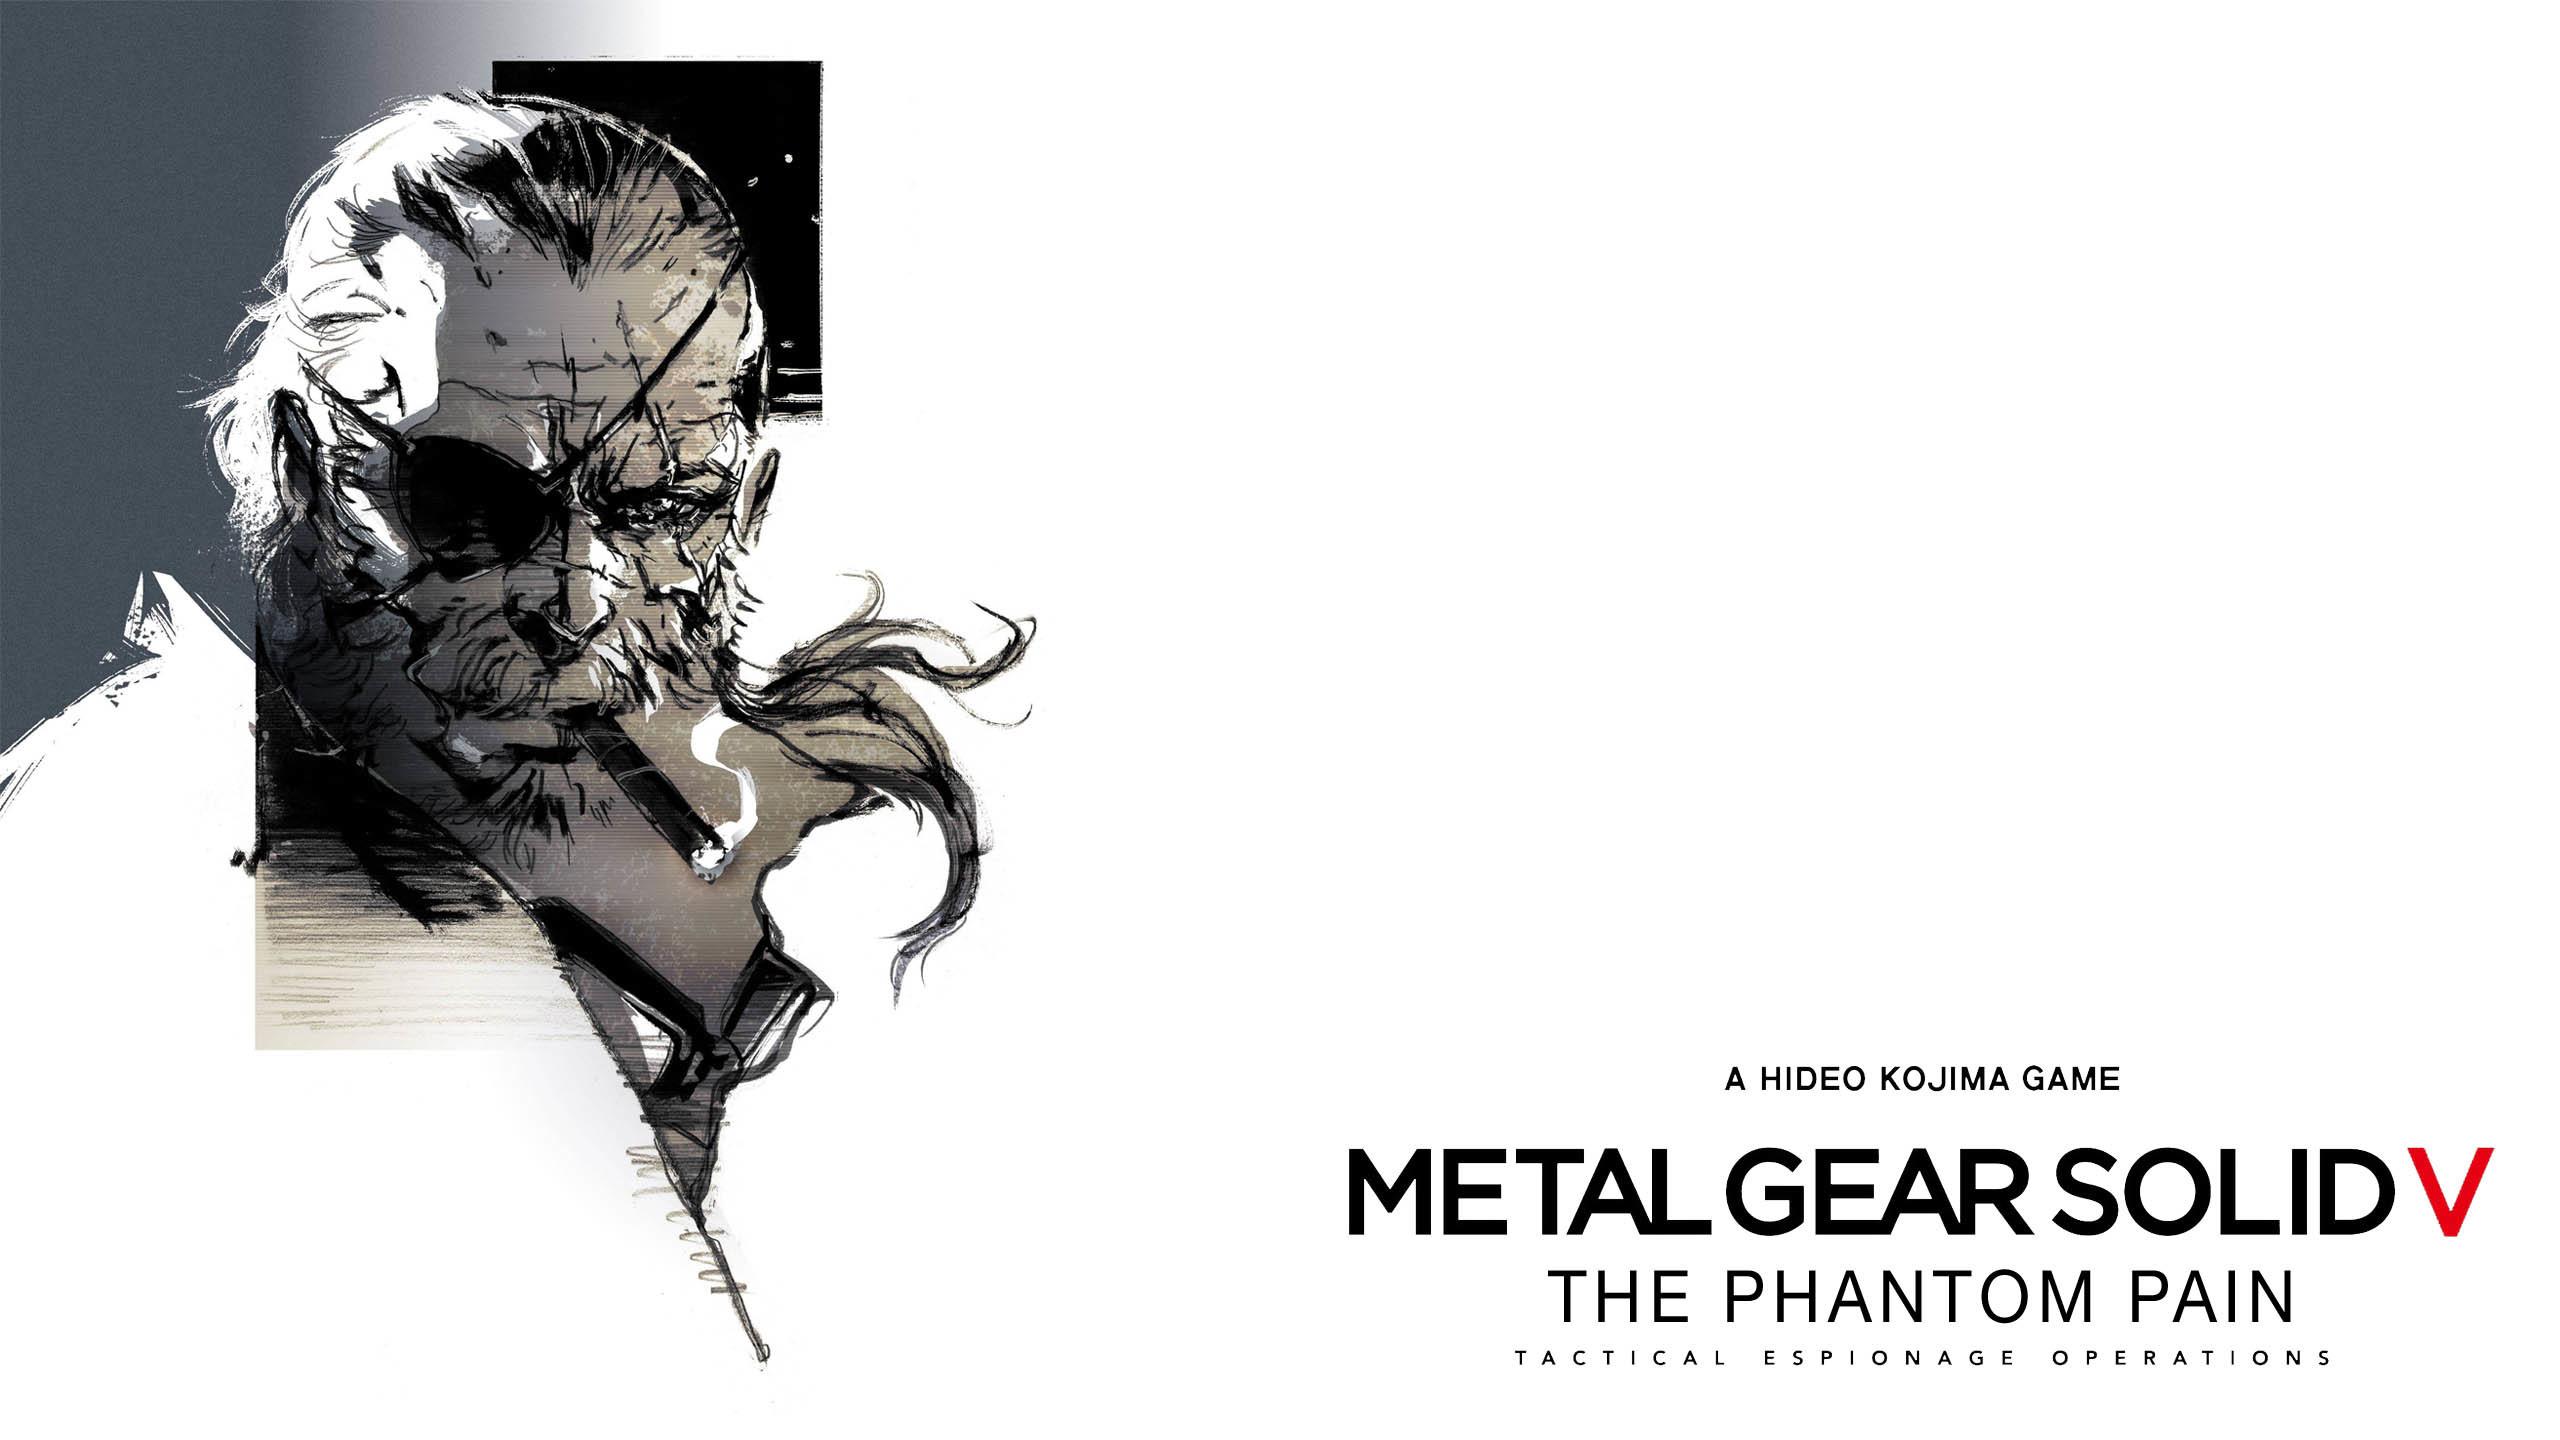 Metal Gear Solid V: The Phantom Pain Big Boss Artwork wallpaper